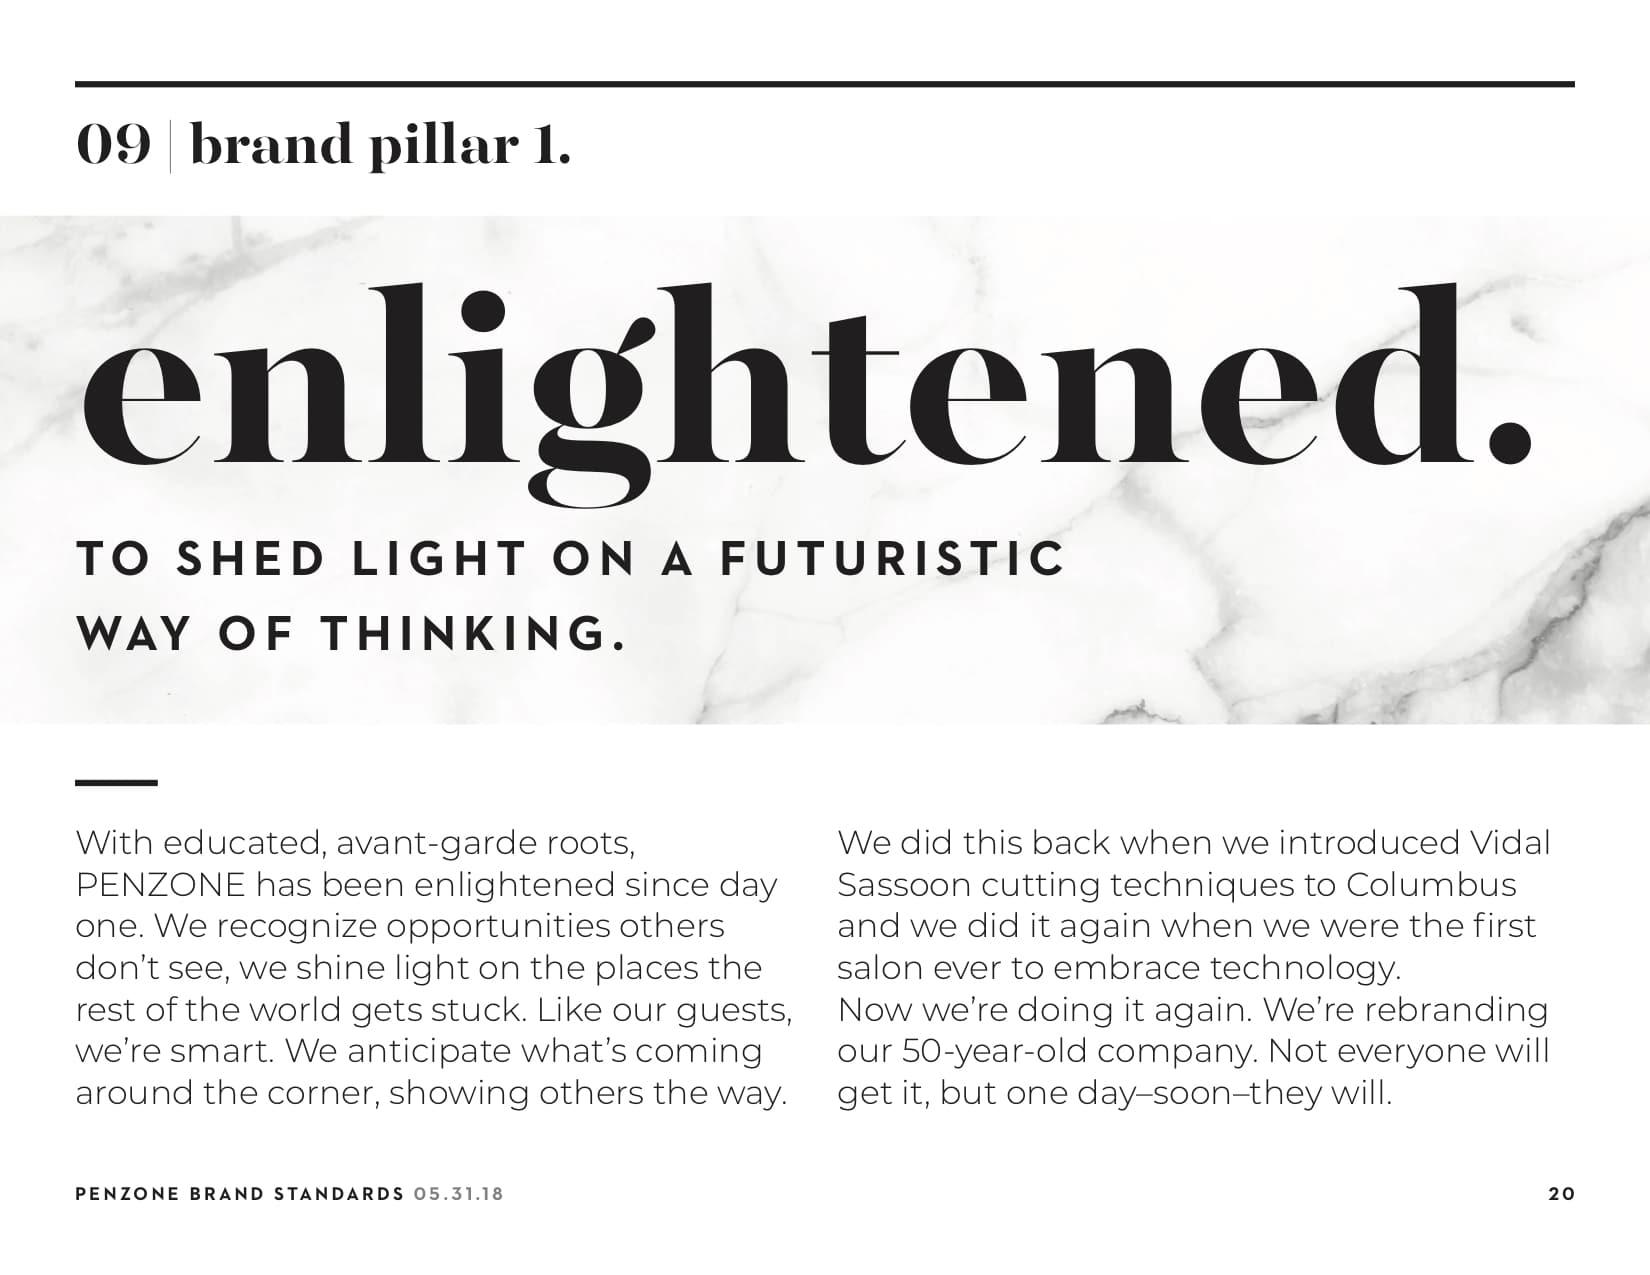 Penzone_Brand-Pillars_Enlightened